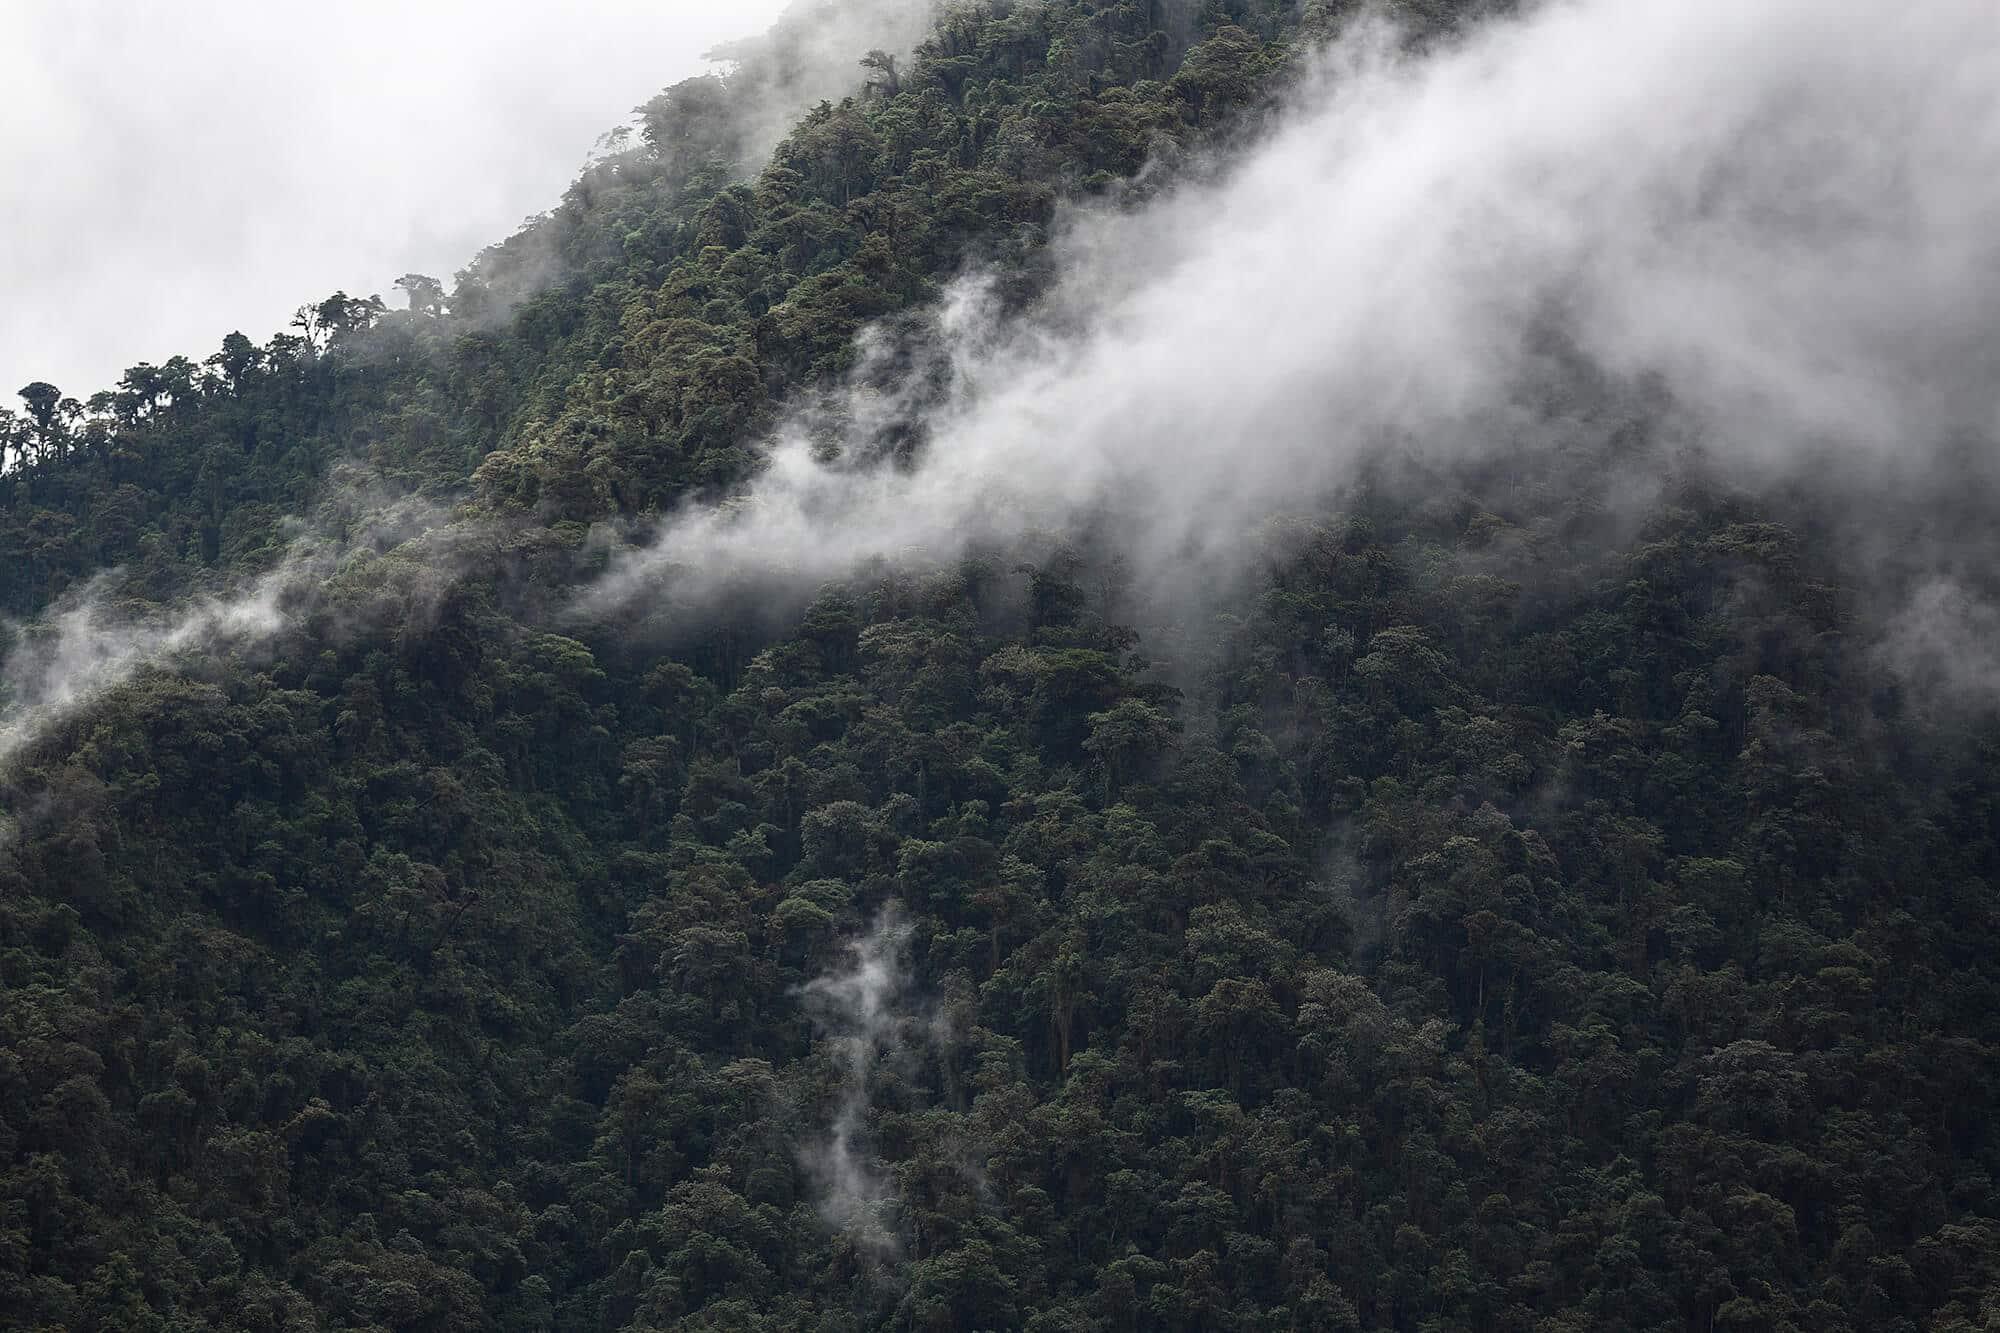 volcanoes and the Ecuadorian jungle